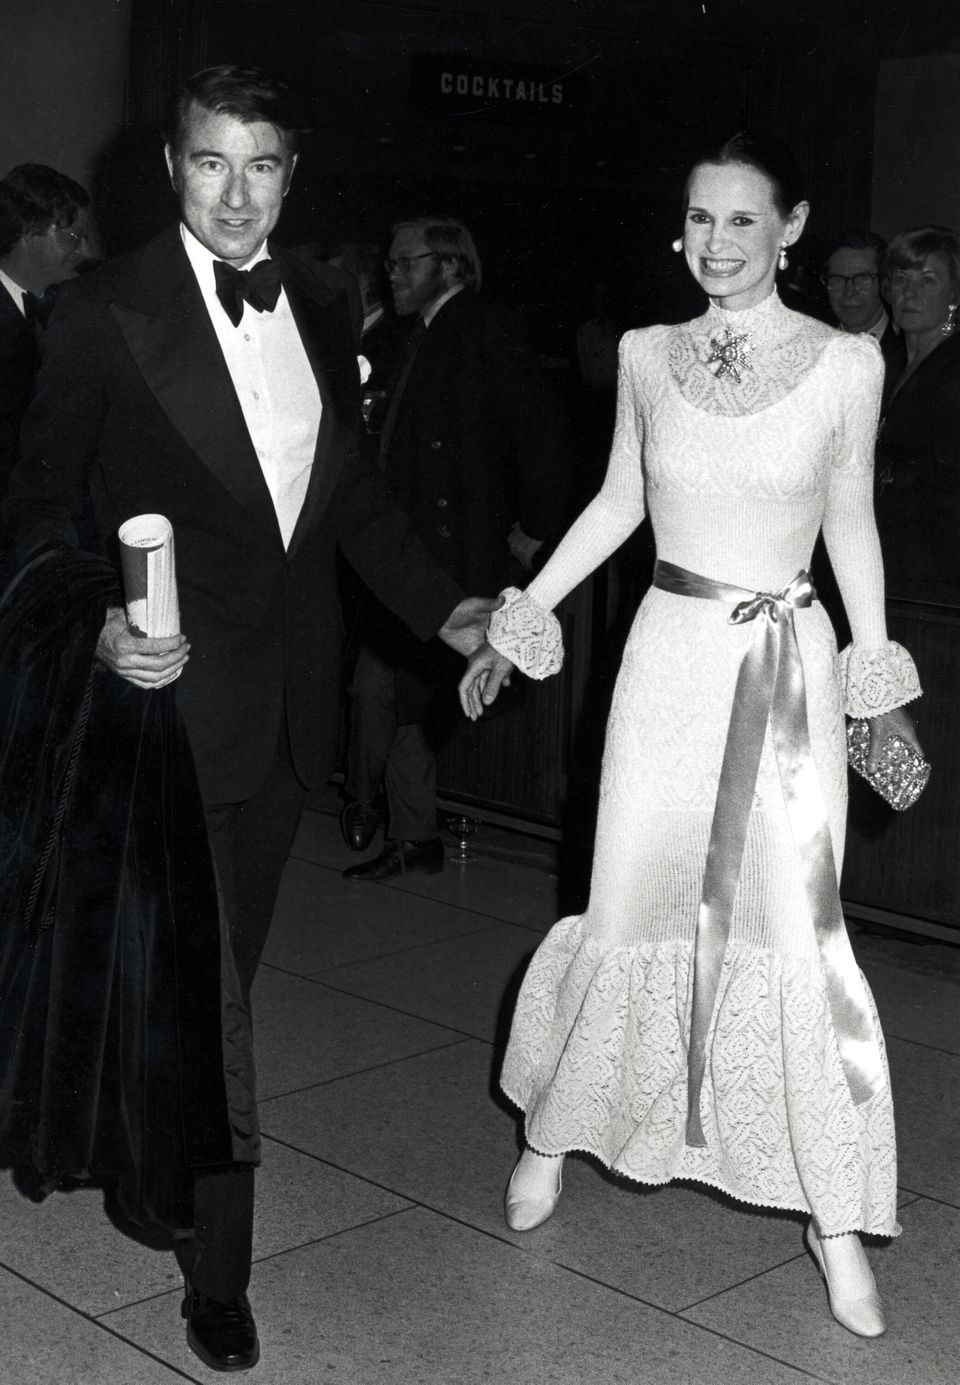 Photos Of Some Of Gloria Vanderbilt's Most Iconic Fashion